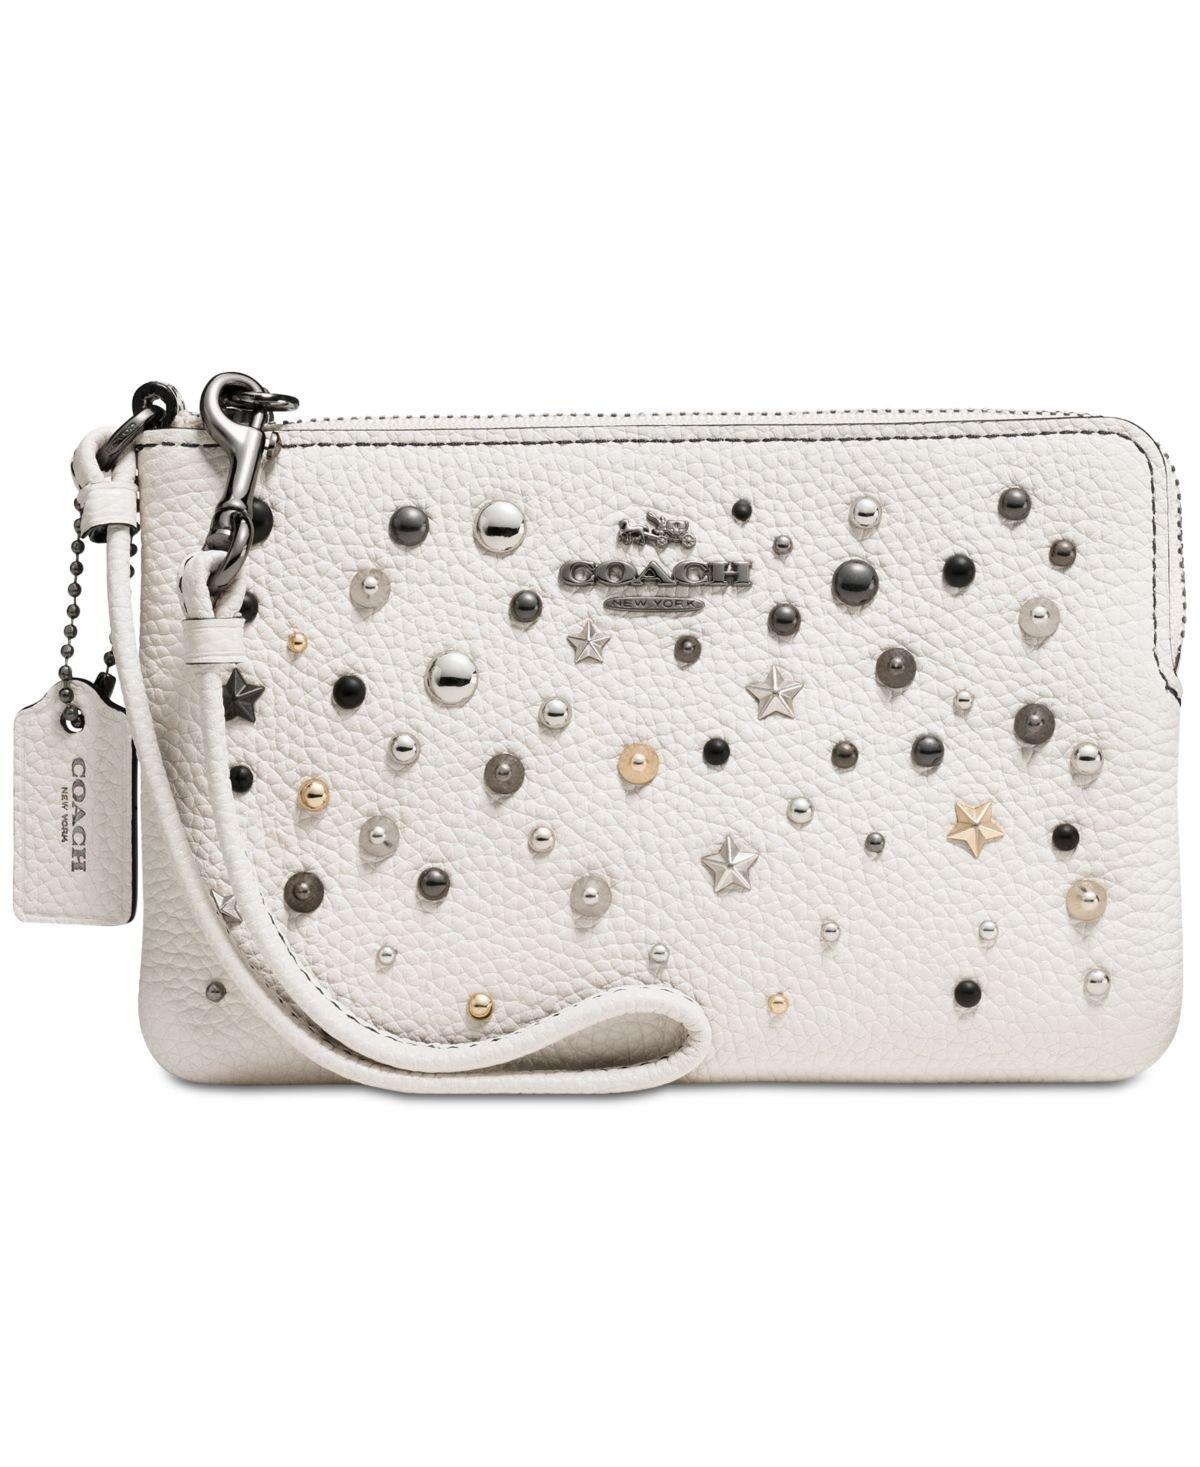 COACH Women's Star Rivets Small Wristlet Dk/Chalk Handbag